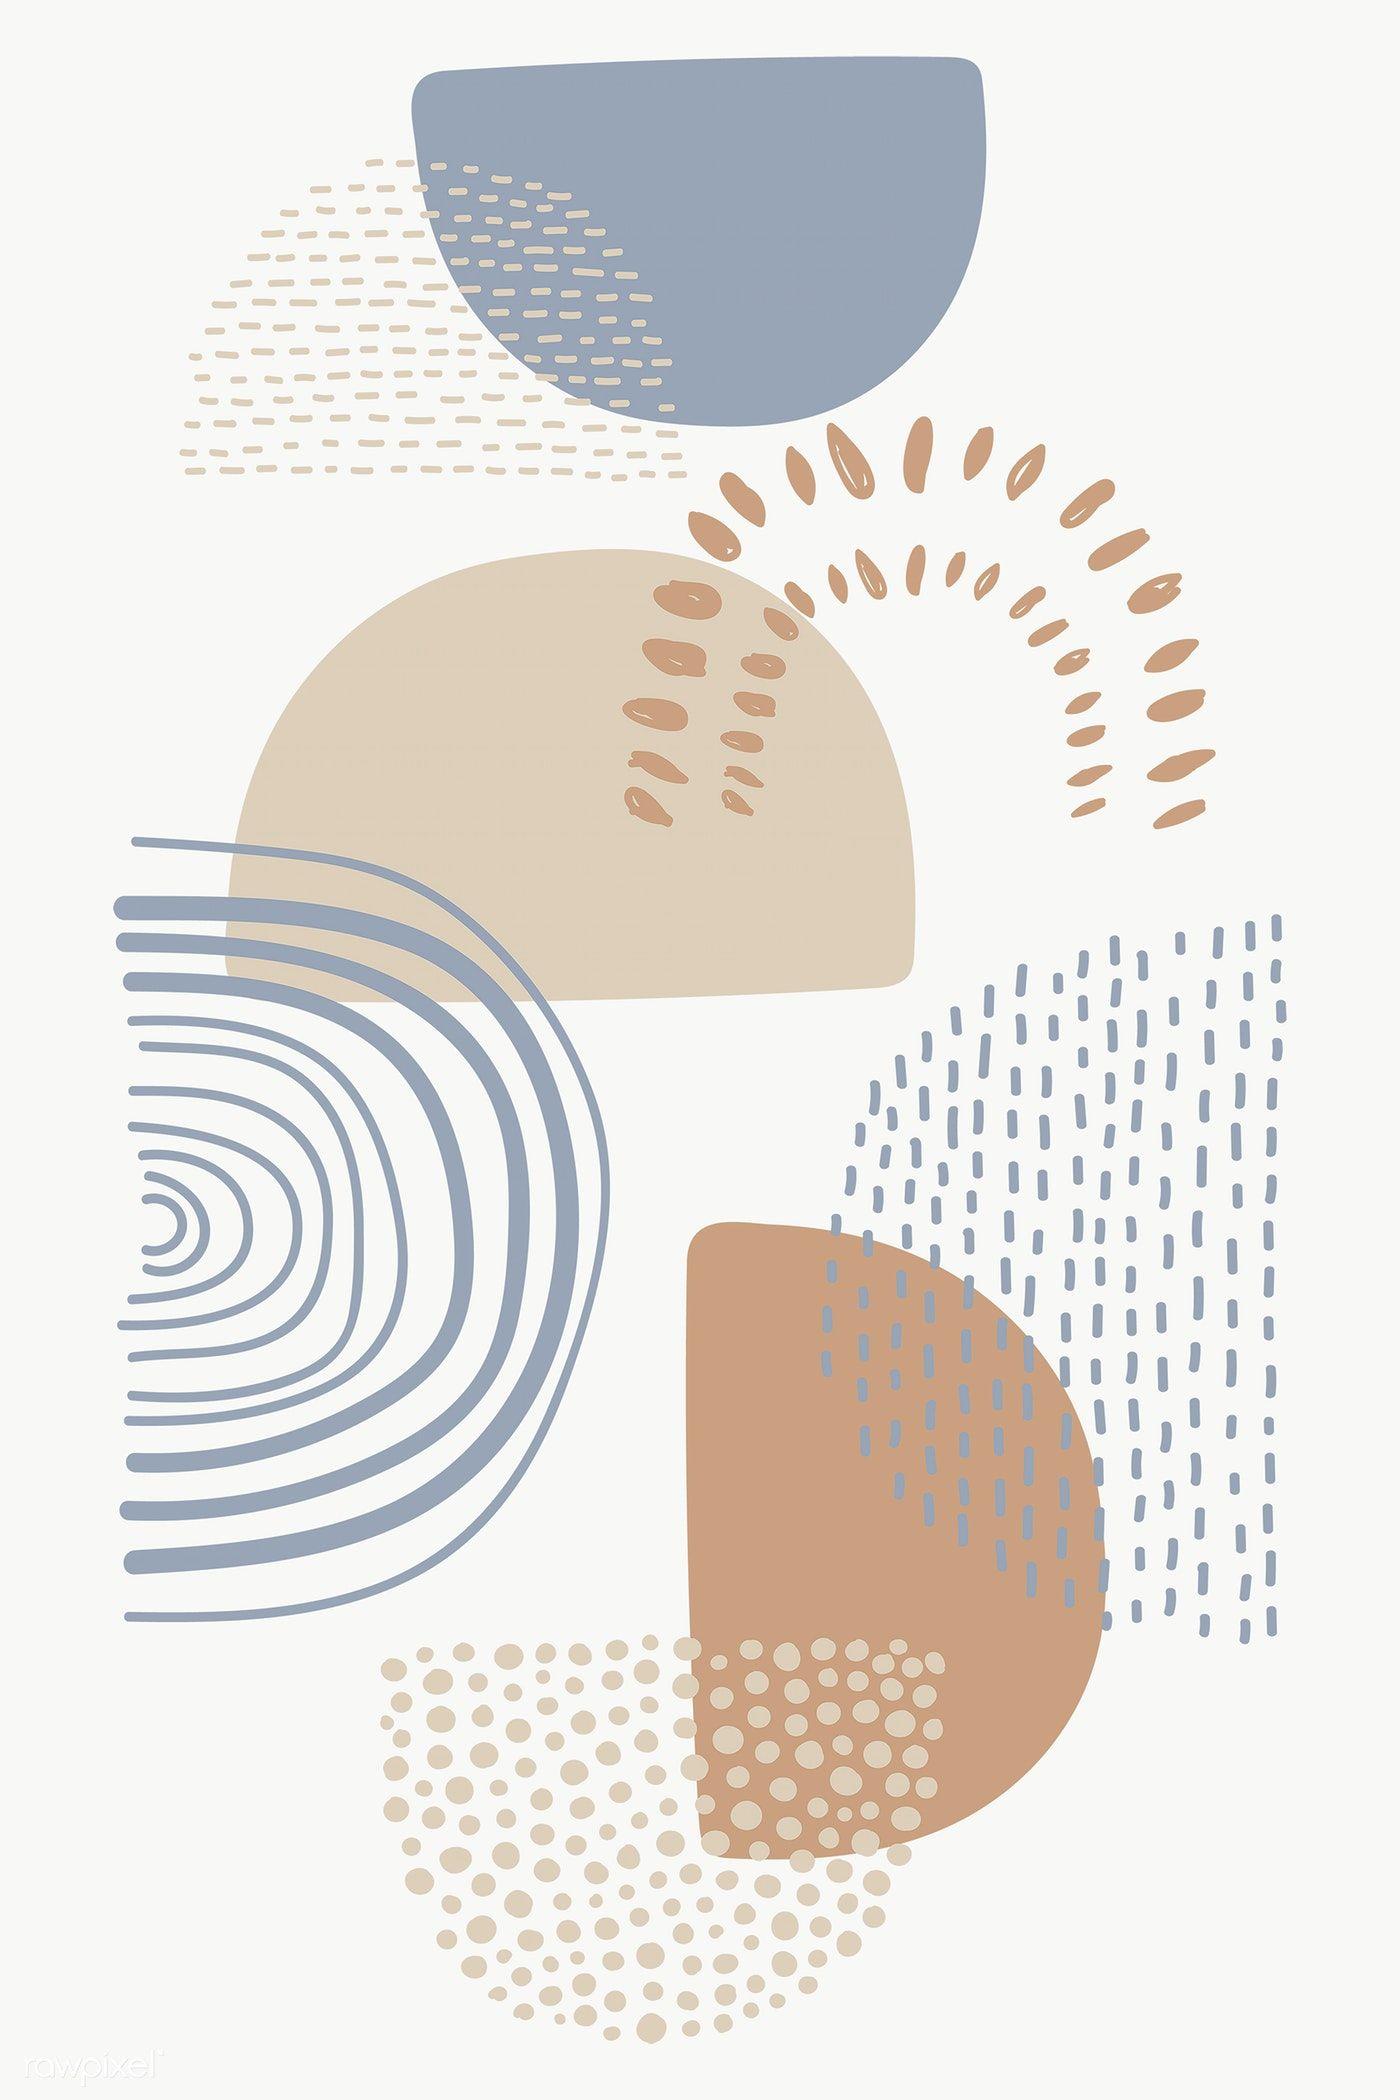 Semicircle Patterned Doodle Background Transparent Png Premium Image By Rawpixel Com Doodle Background Cute Patterns Wallpaper Iphone Background Wallpaper